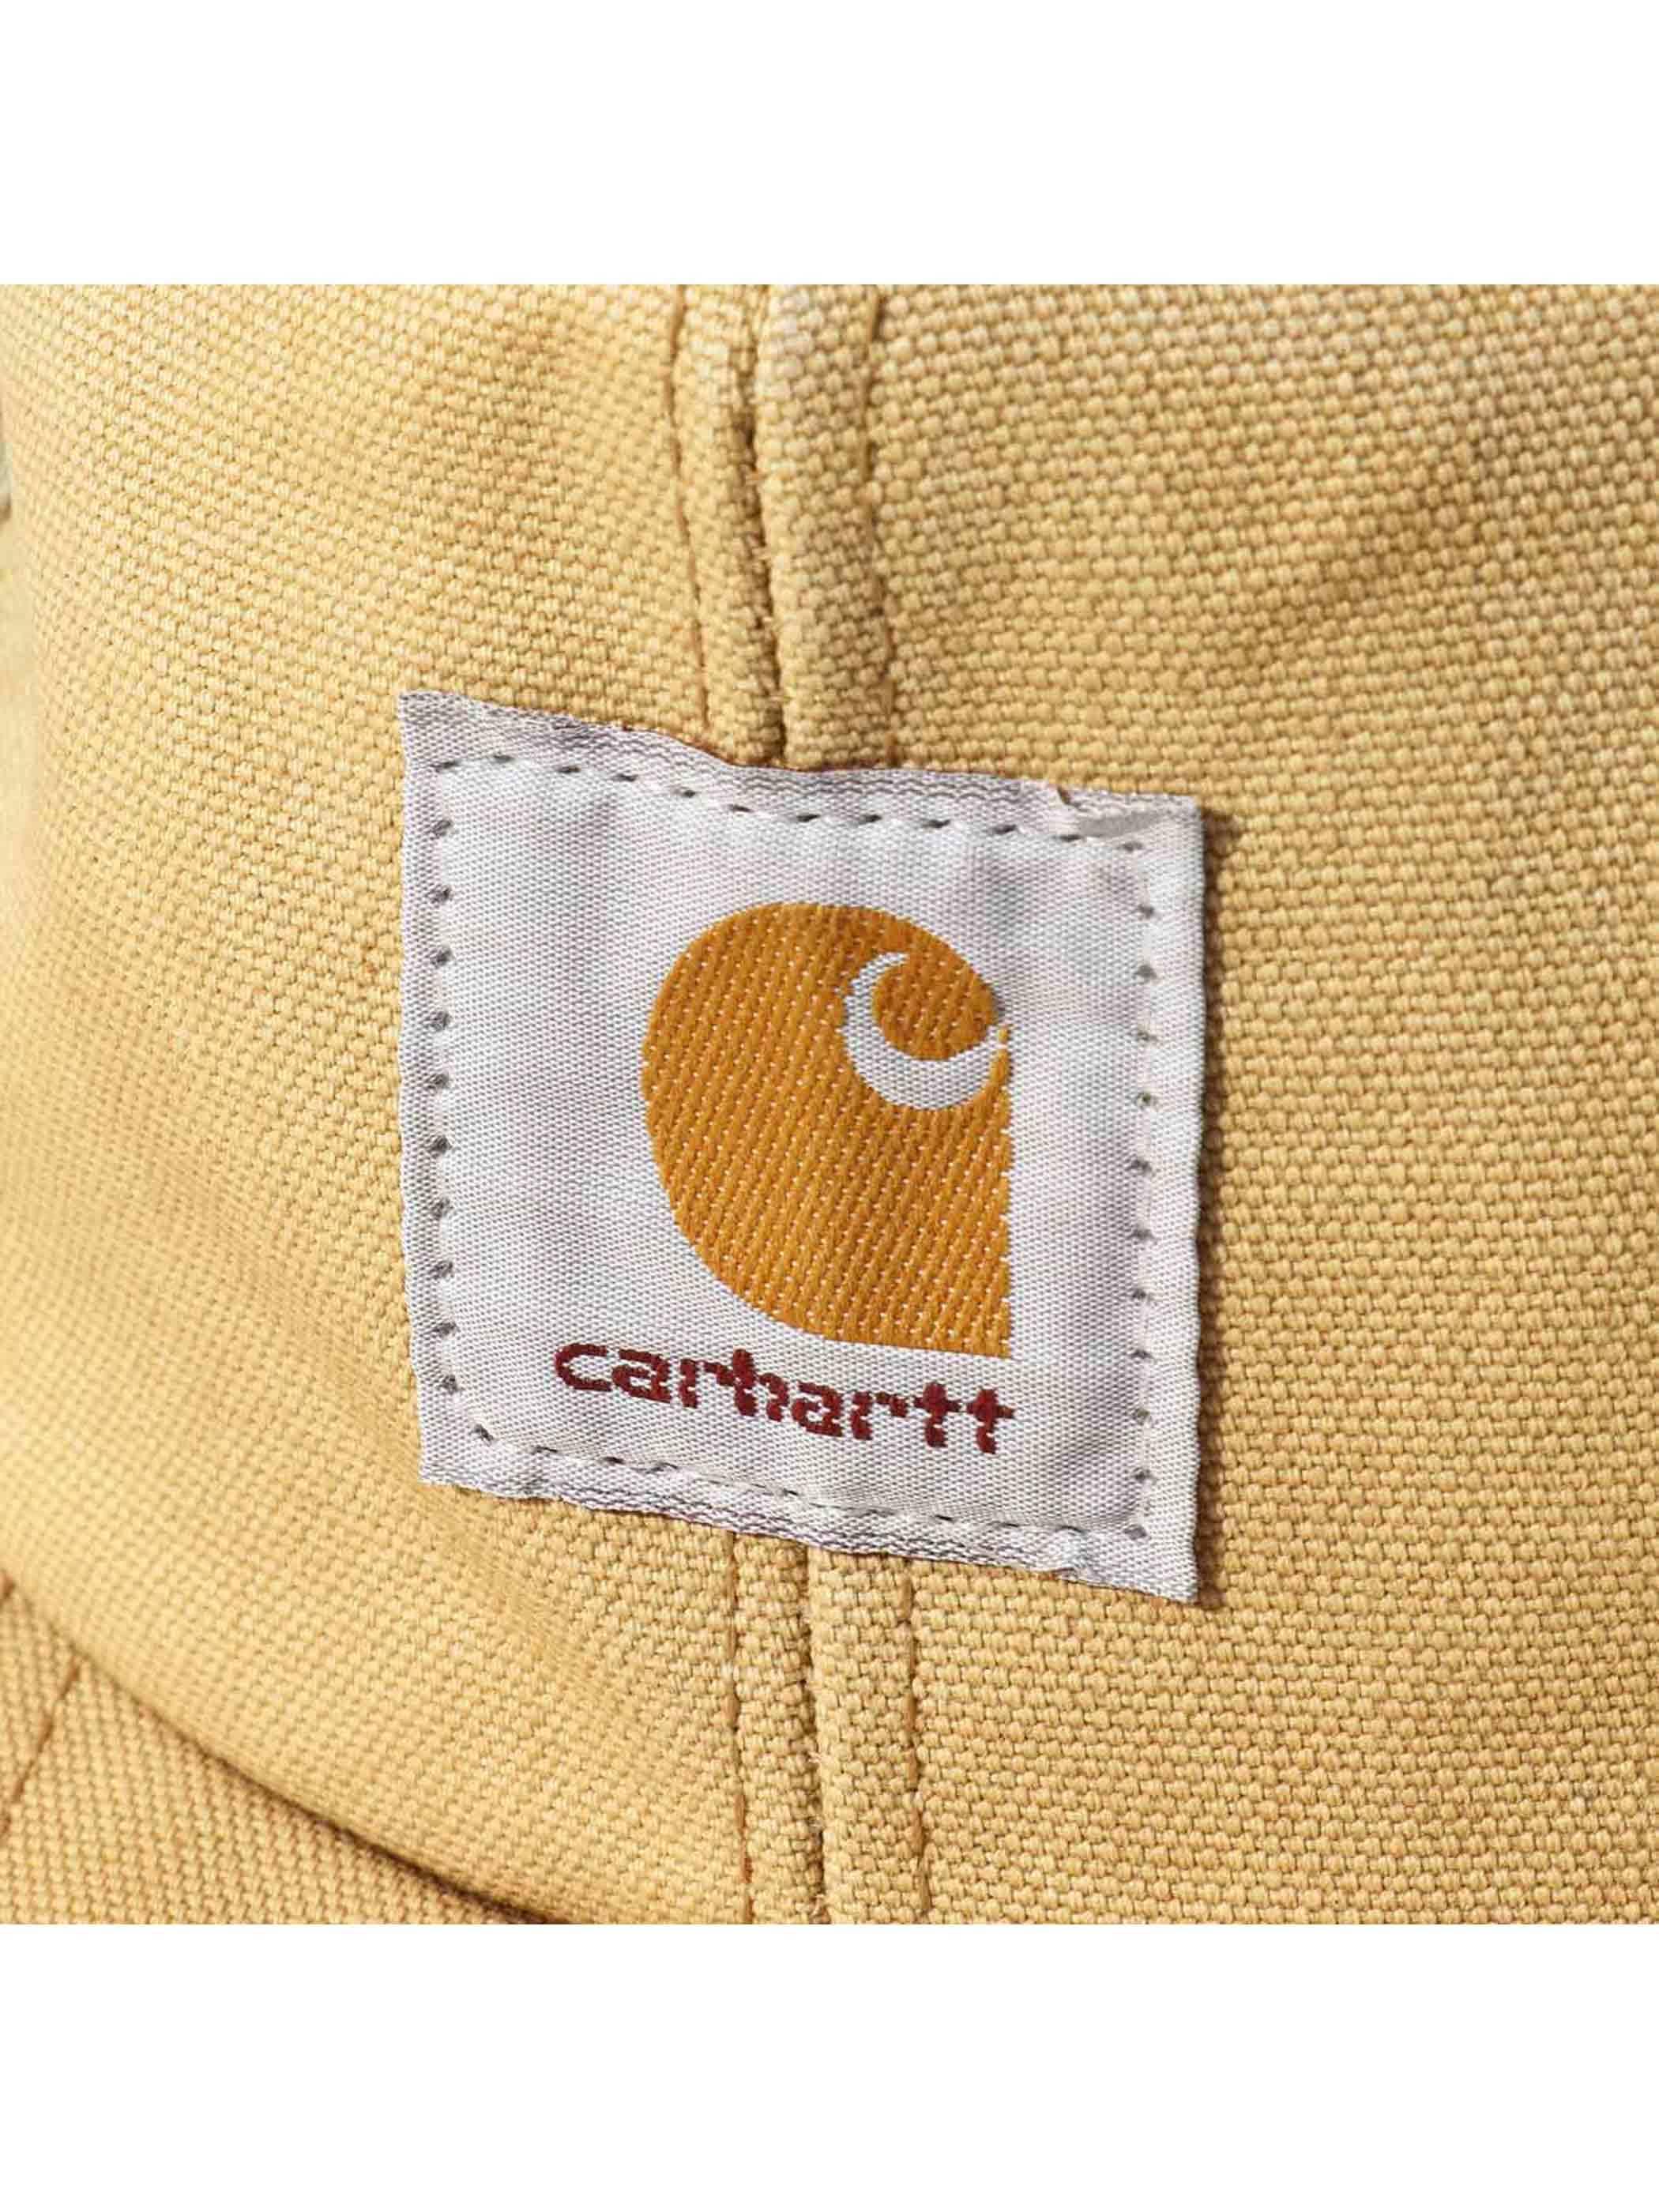 90's CARHARTT USA製 コットンダック メッシュキャップ [FREE]